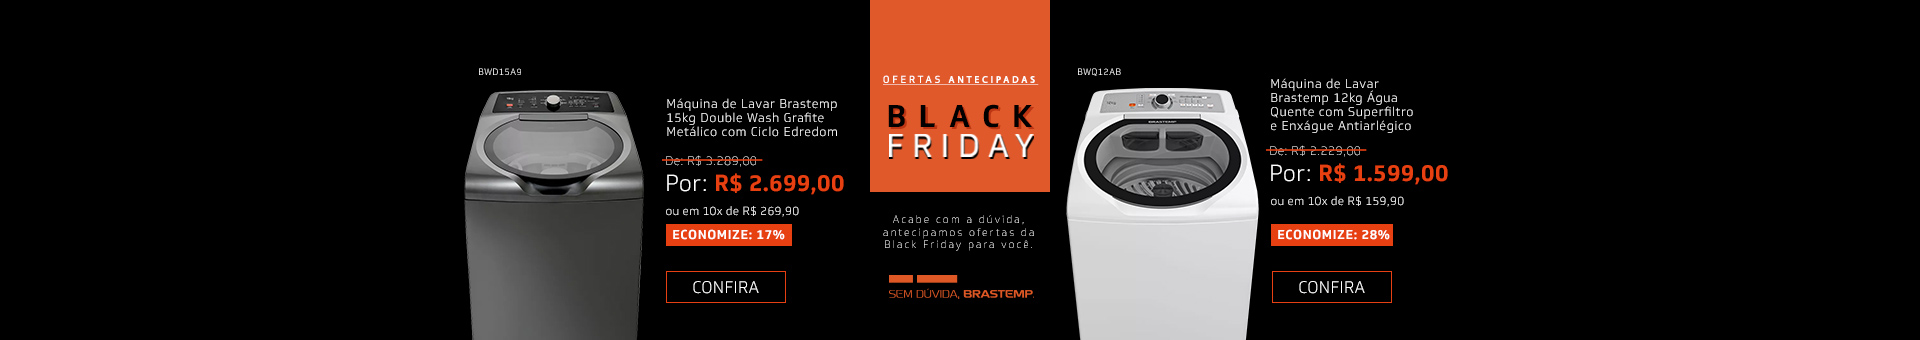 Promoção Interna - 2560 - campanha-antecipadasbf-preco_BWD15A9-BWQ12AB_12112018_home3 - BWD15A9-BWQ12AB - 3